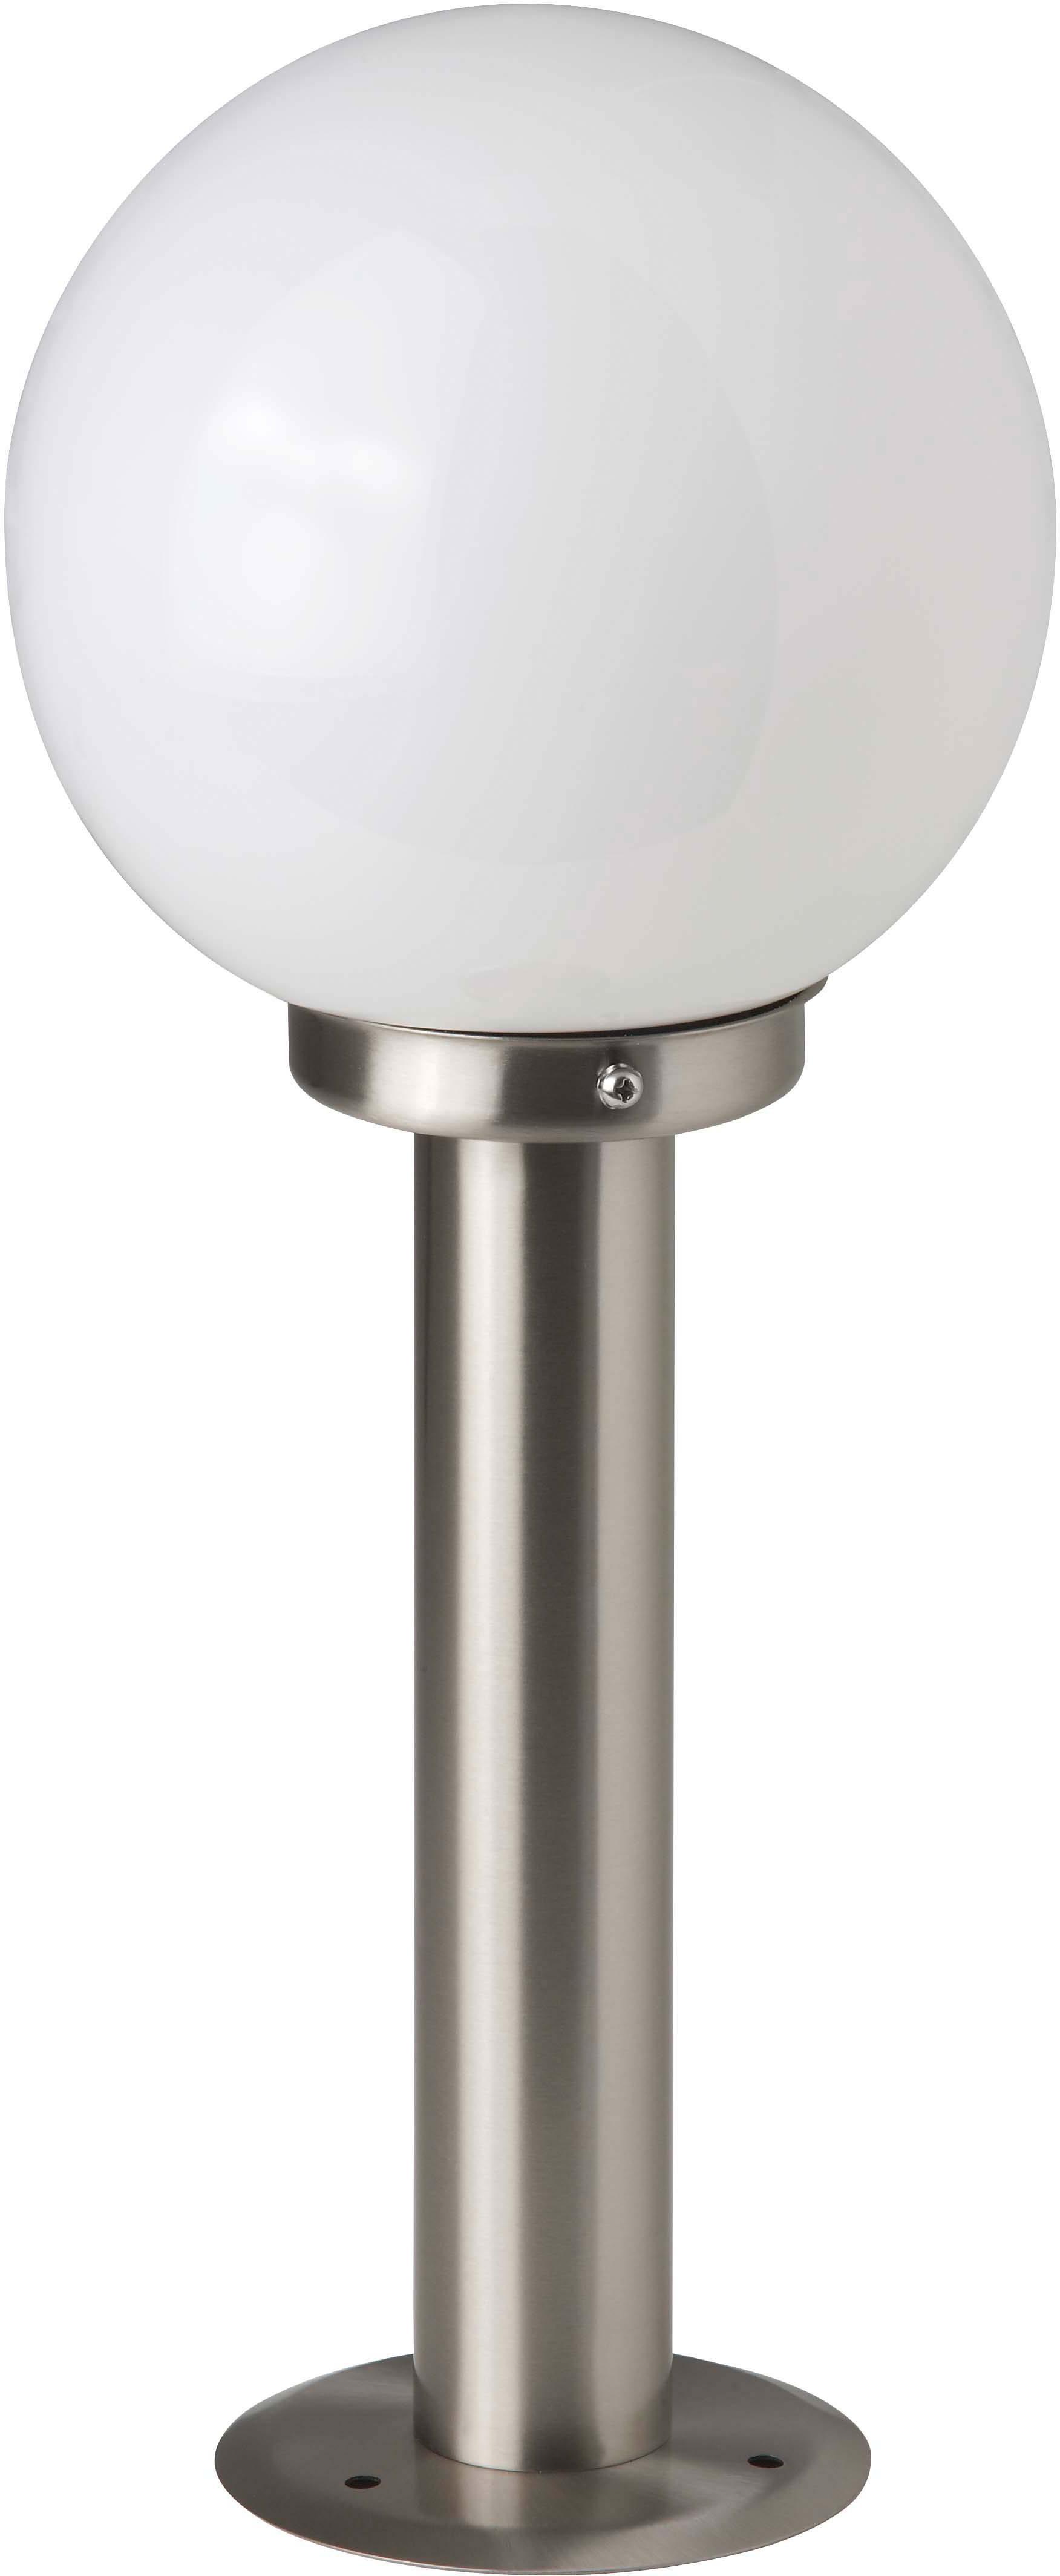 Brilliant LED Außenleuchte, 1 flg., Sockelleuchte, »AALBORG«